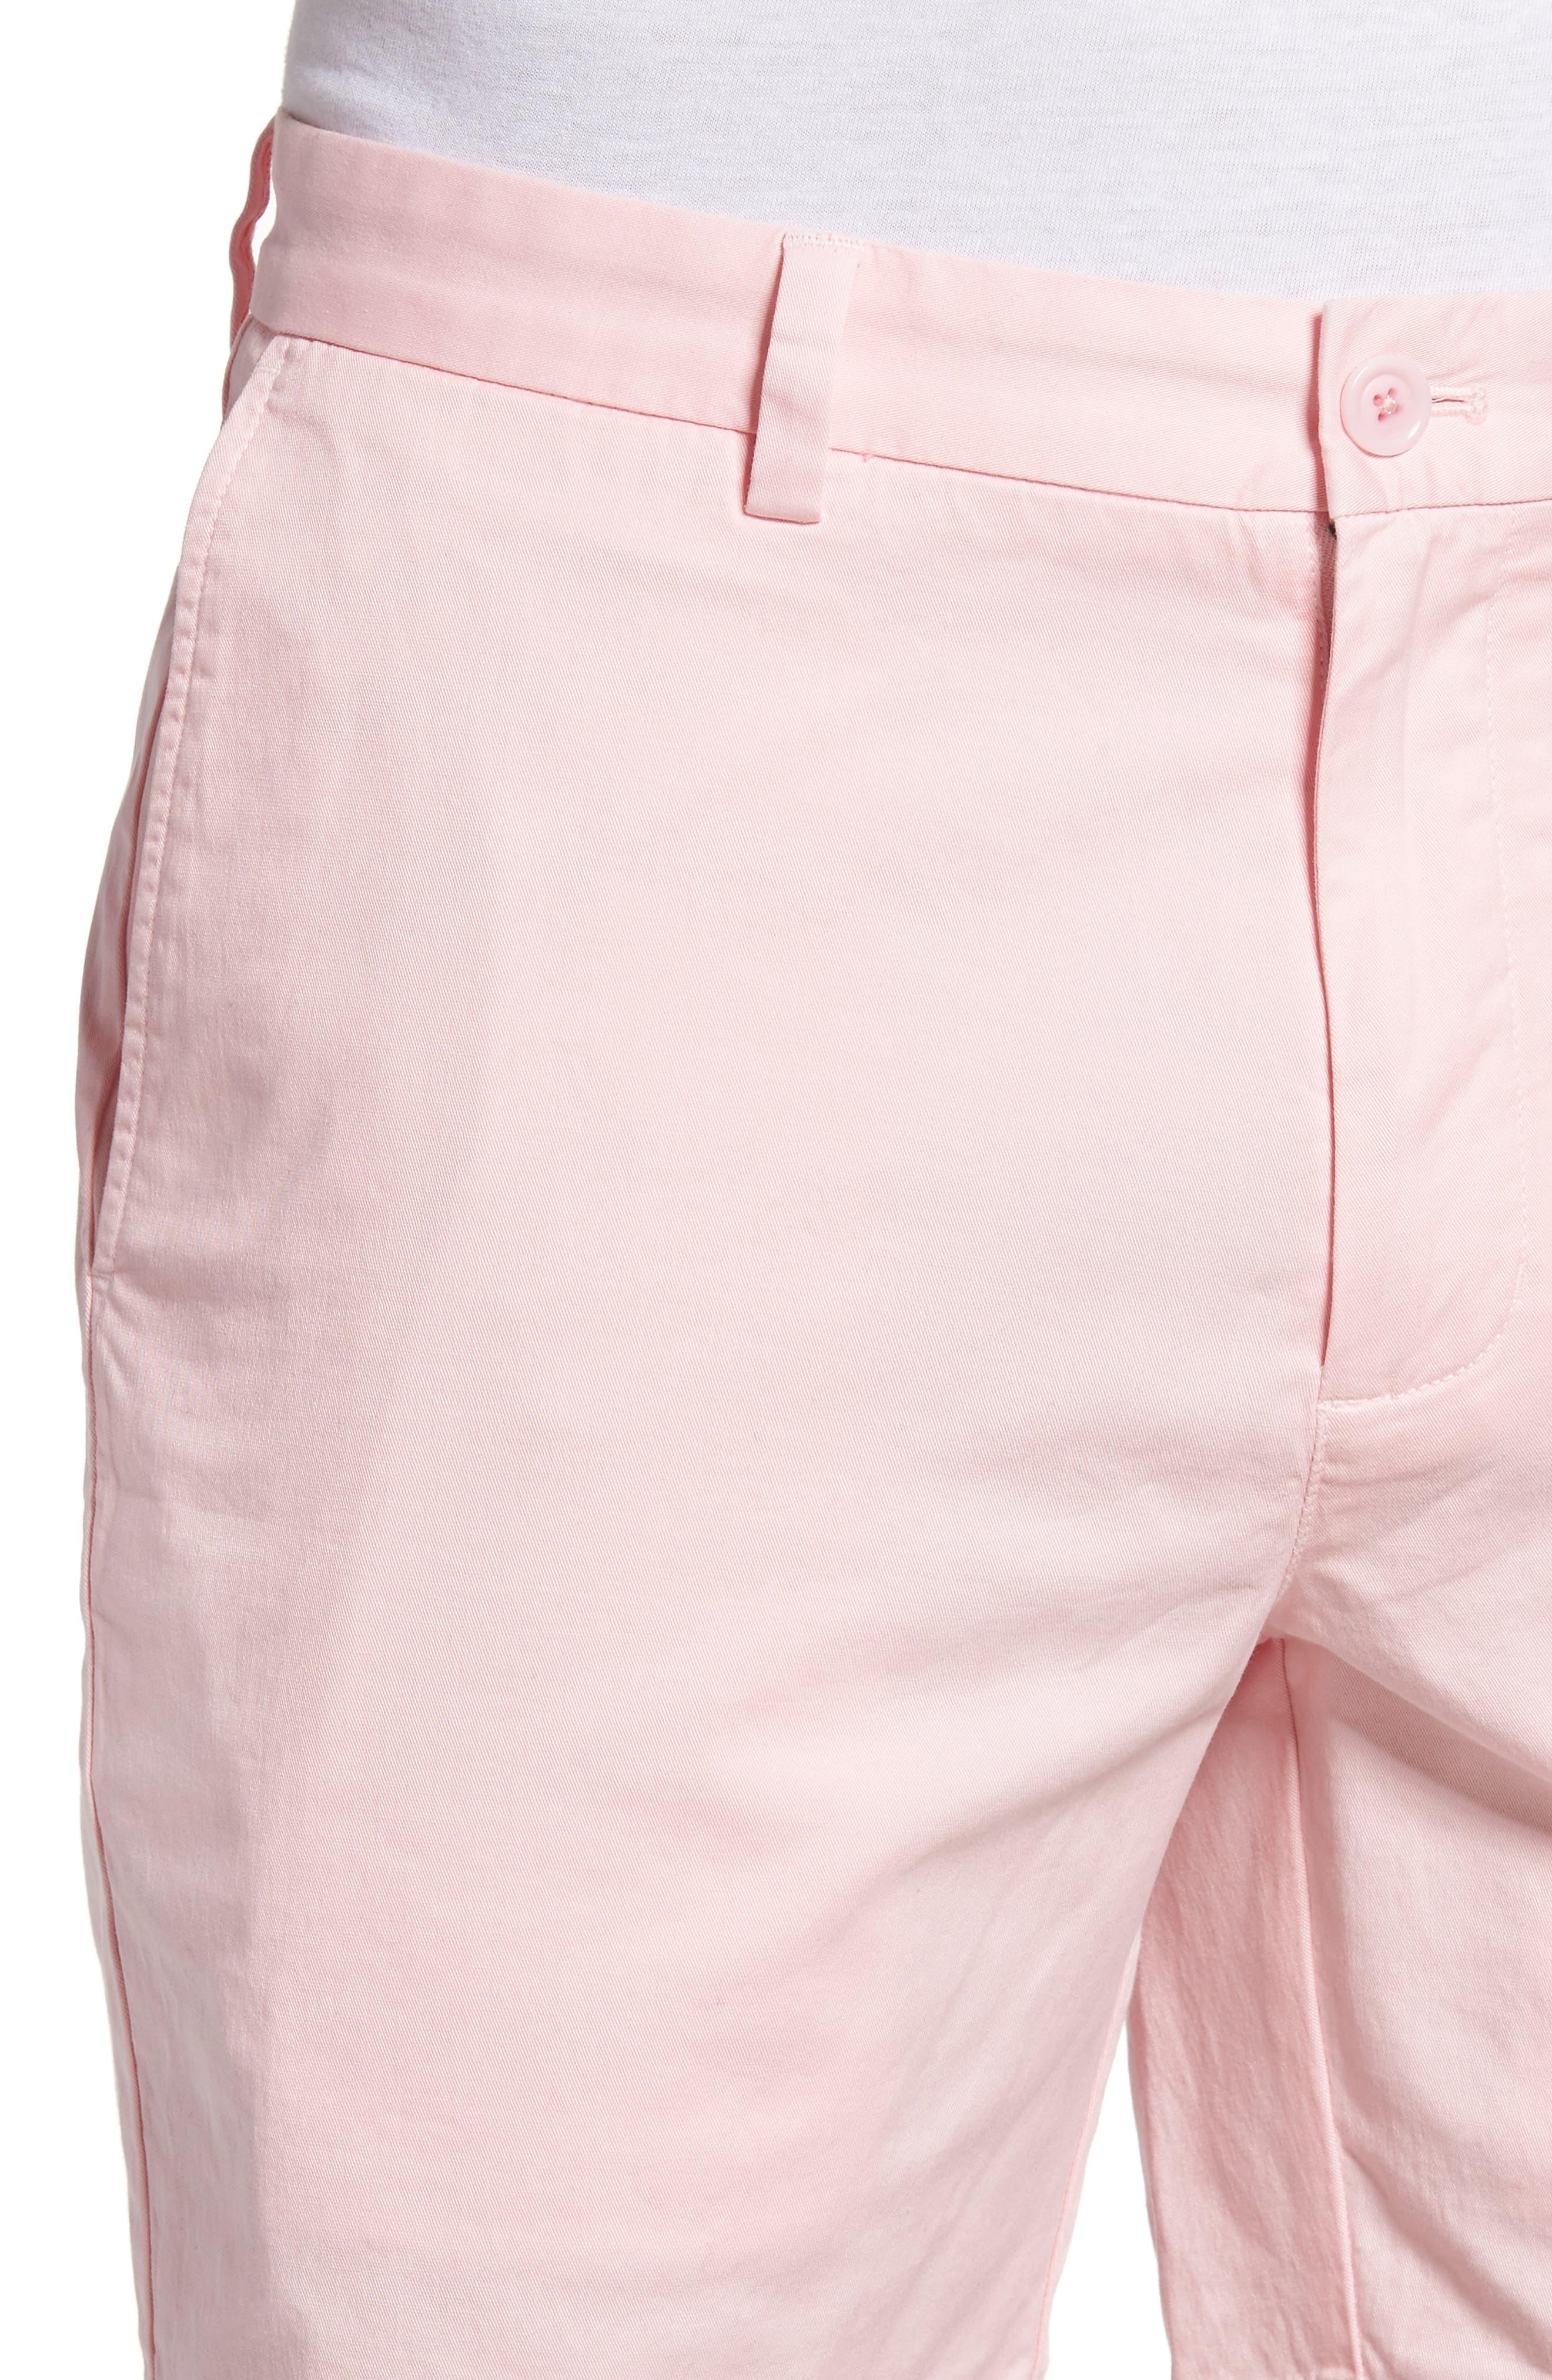 9 Inch Stretch Breaker Shorts,                             Alternate thumbnail 88, color,